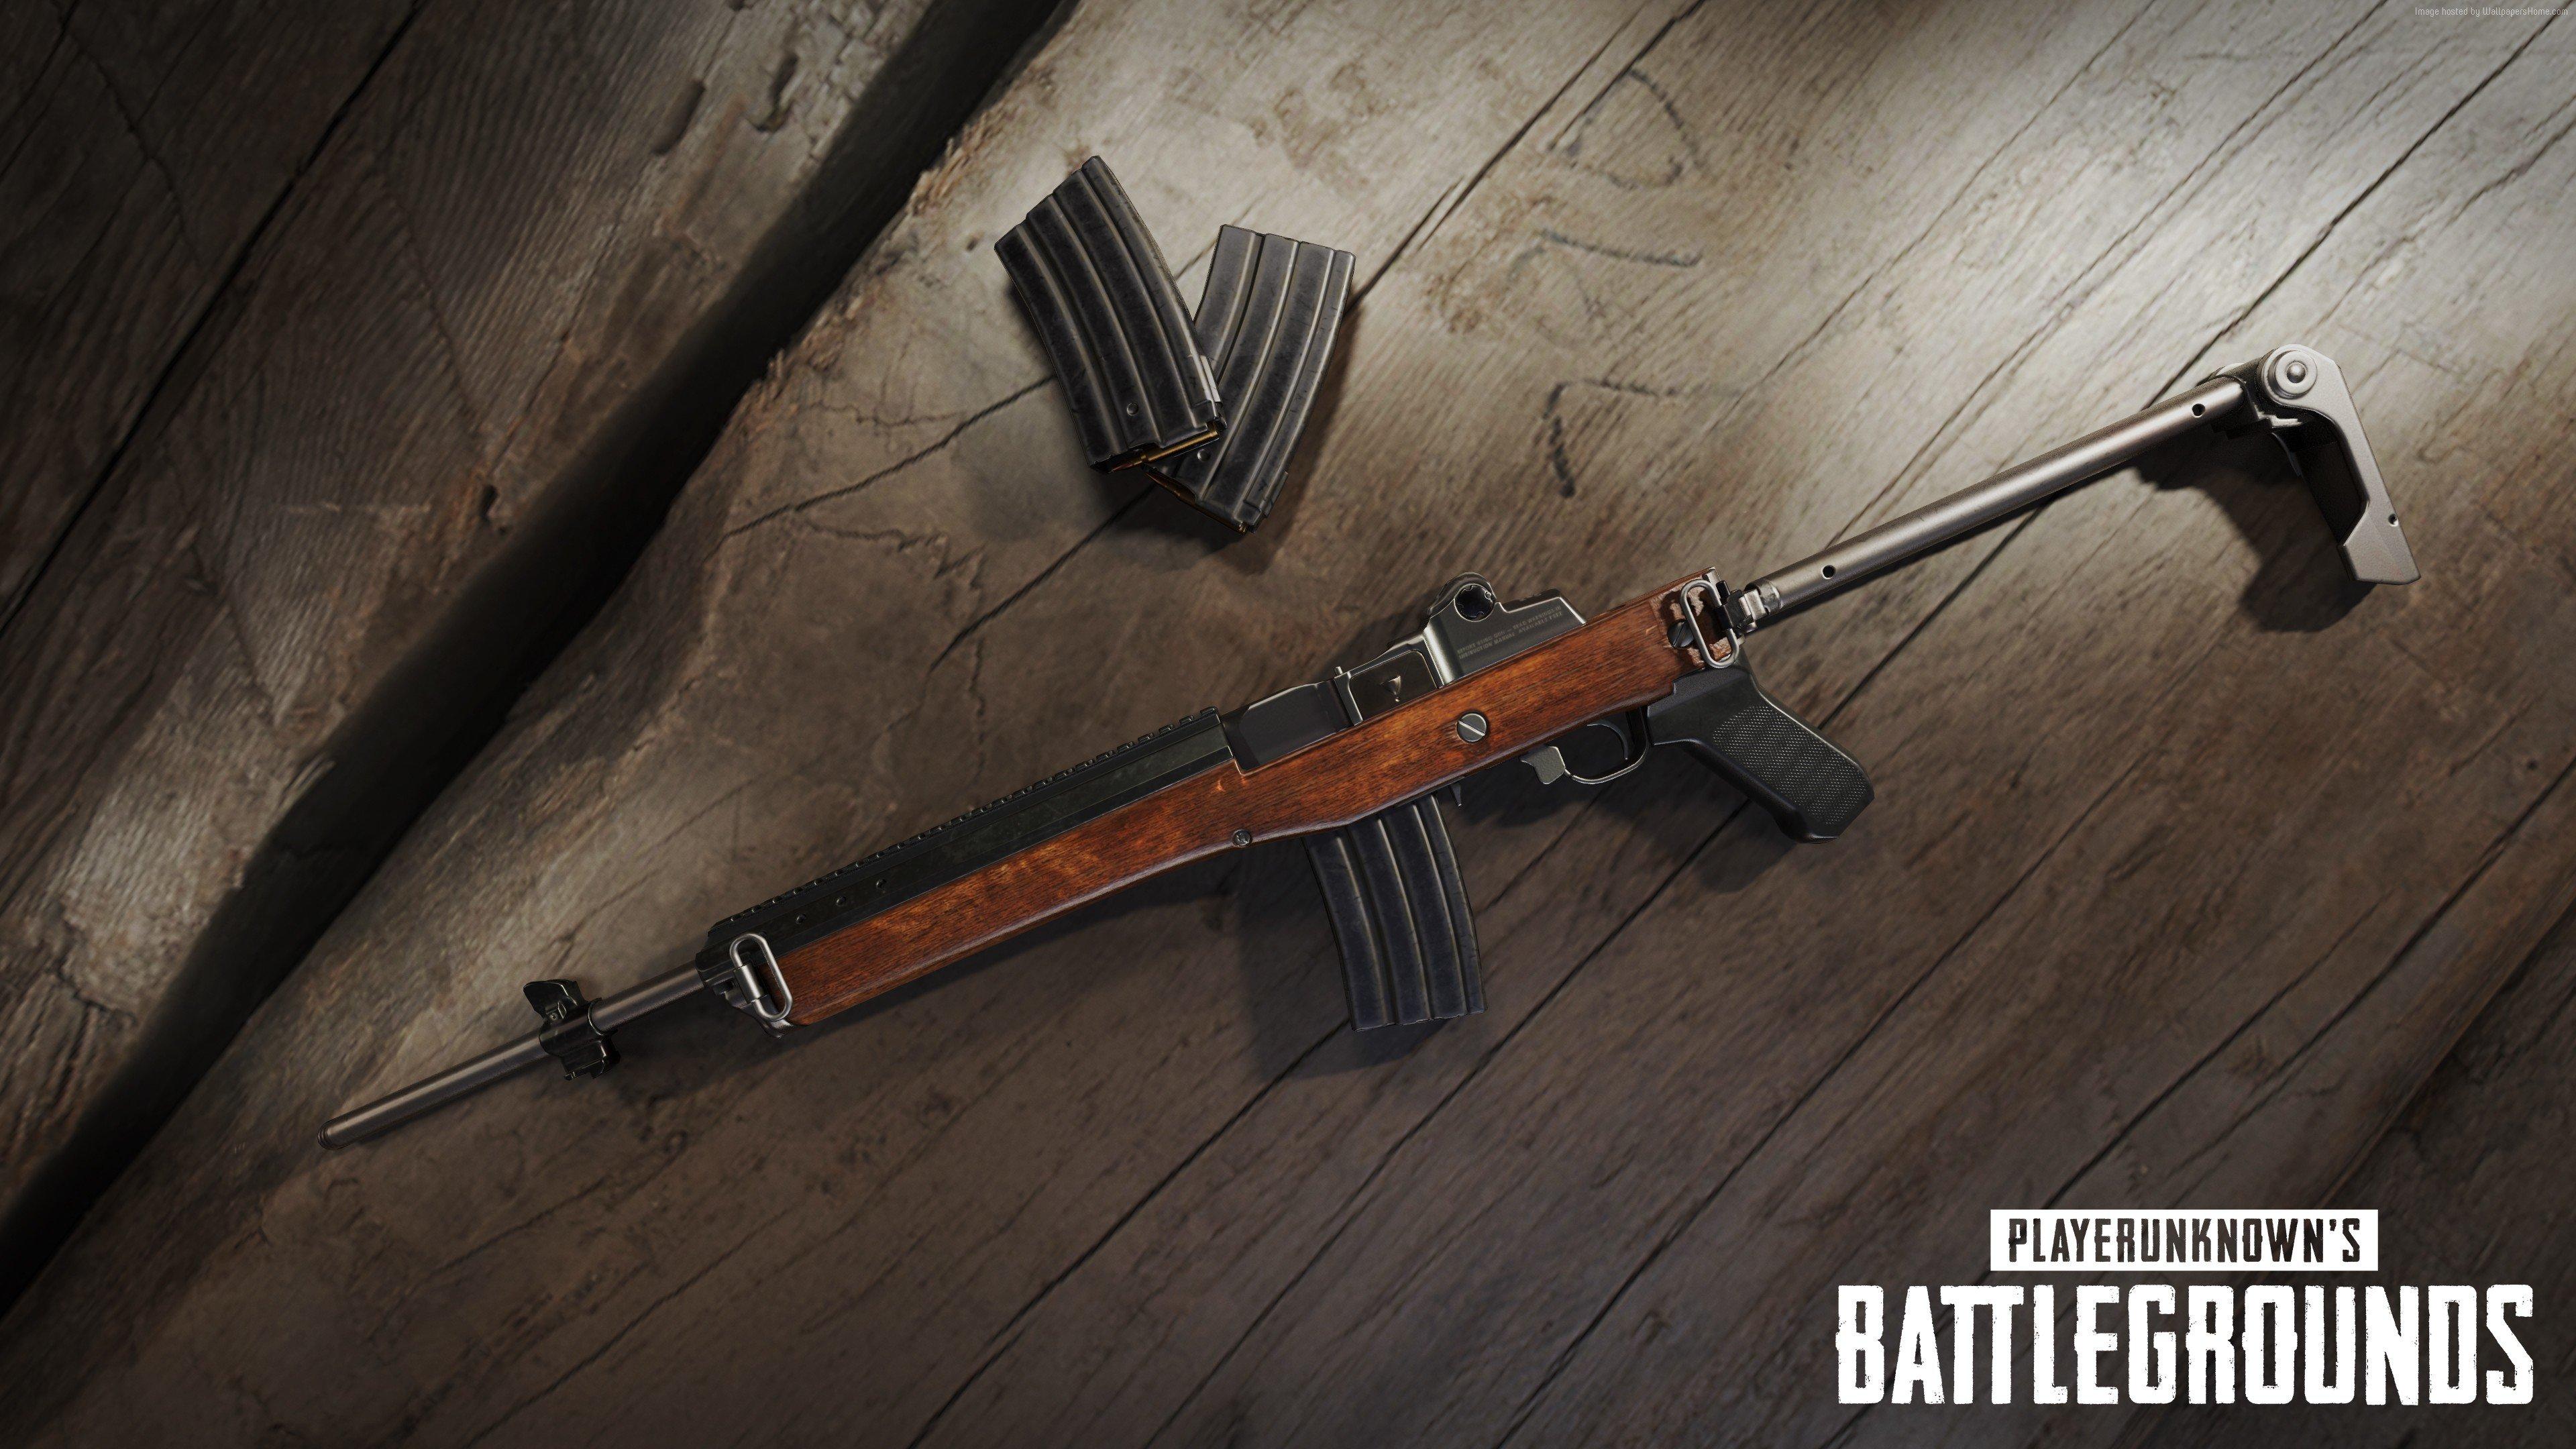 Wallpaper Weapons PlayerUnknown's Battlegrounds